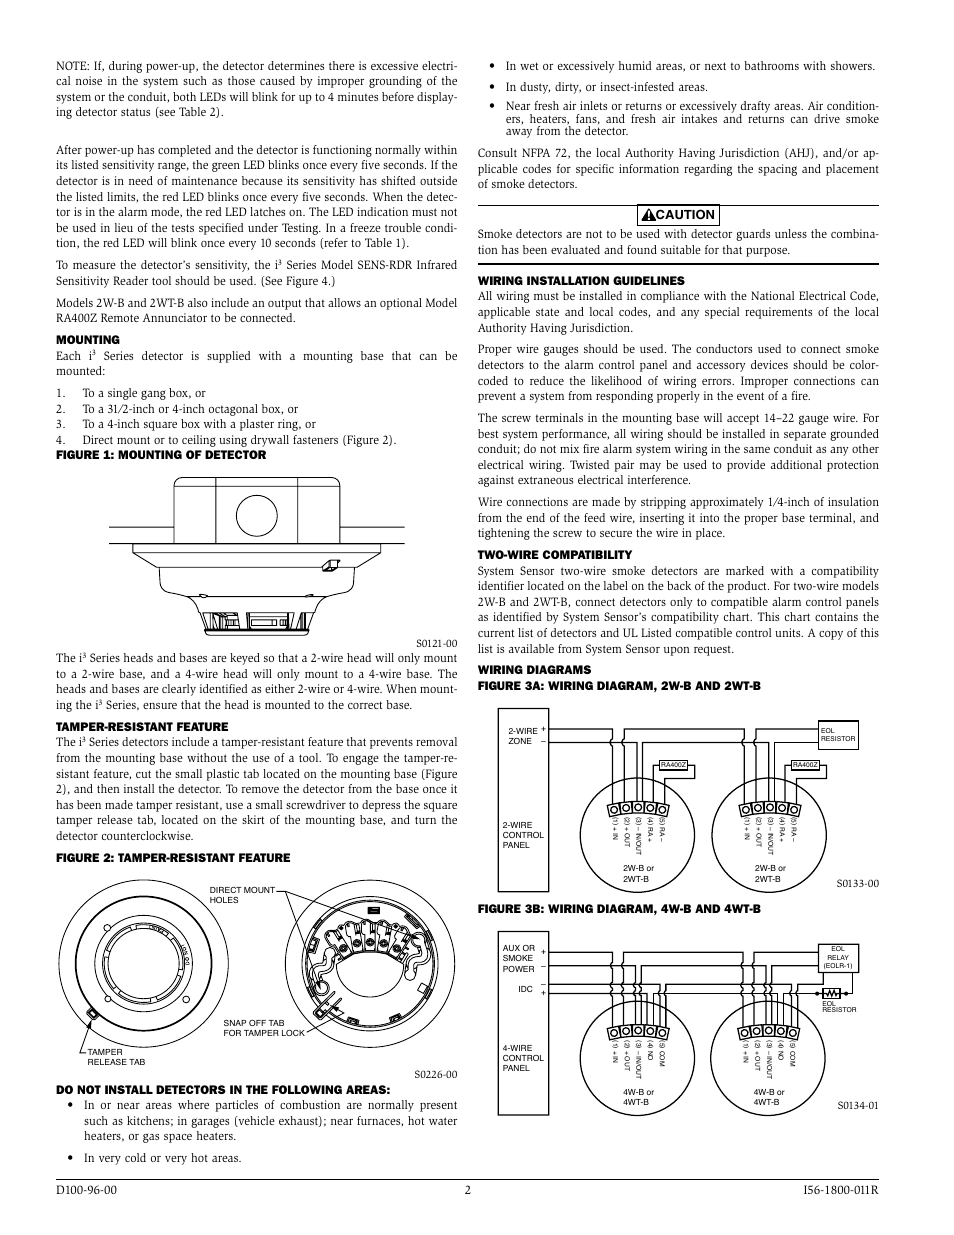 medium resolution of the i figure 3b wiring diagram 4w b and 4wt b system sensor i3 series smoke detectors user manual page 2 4